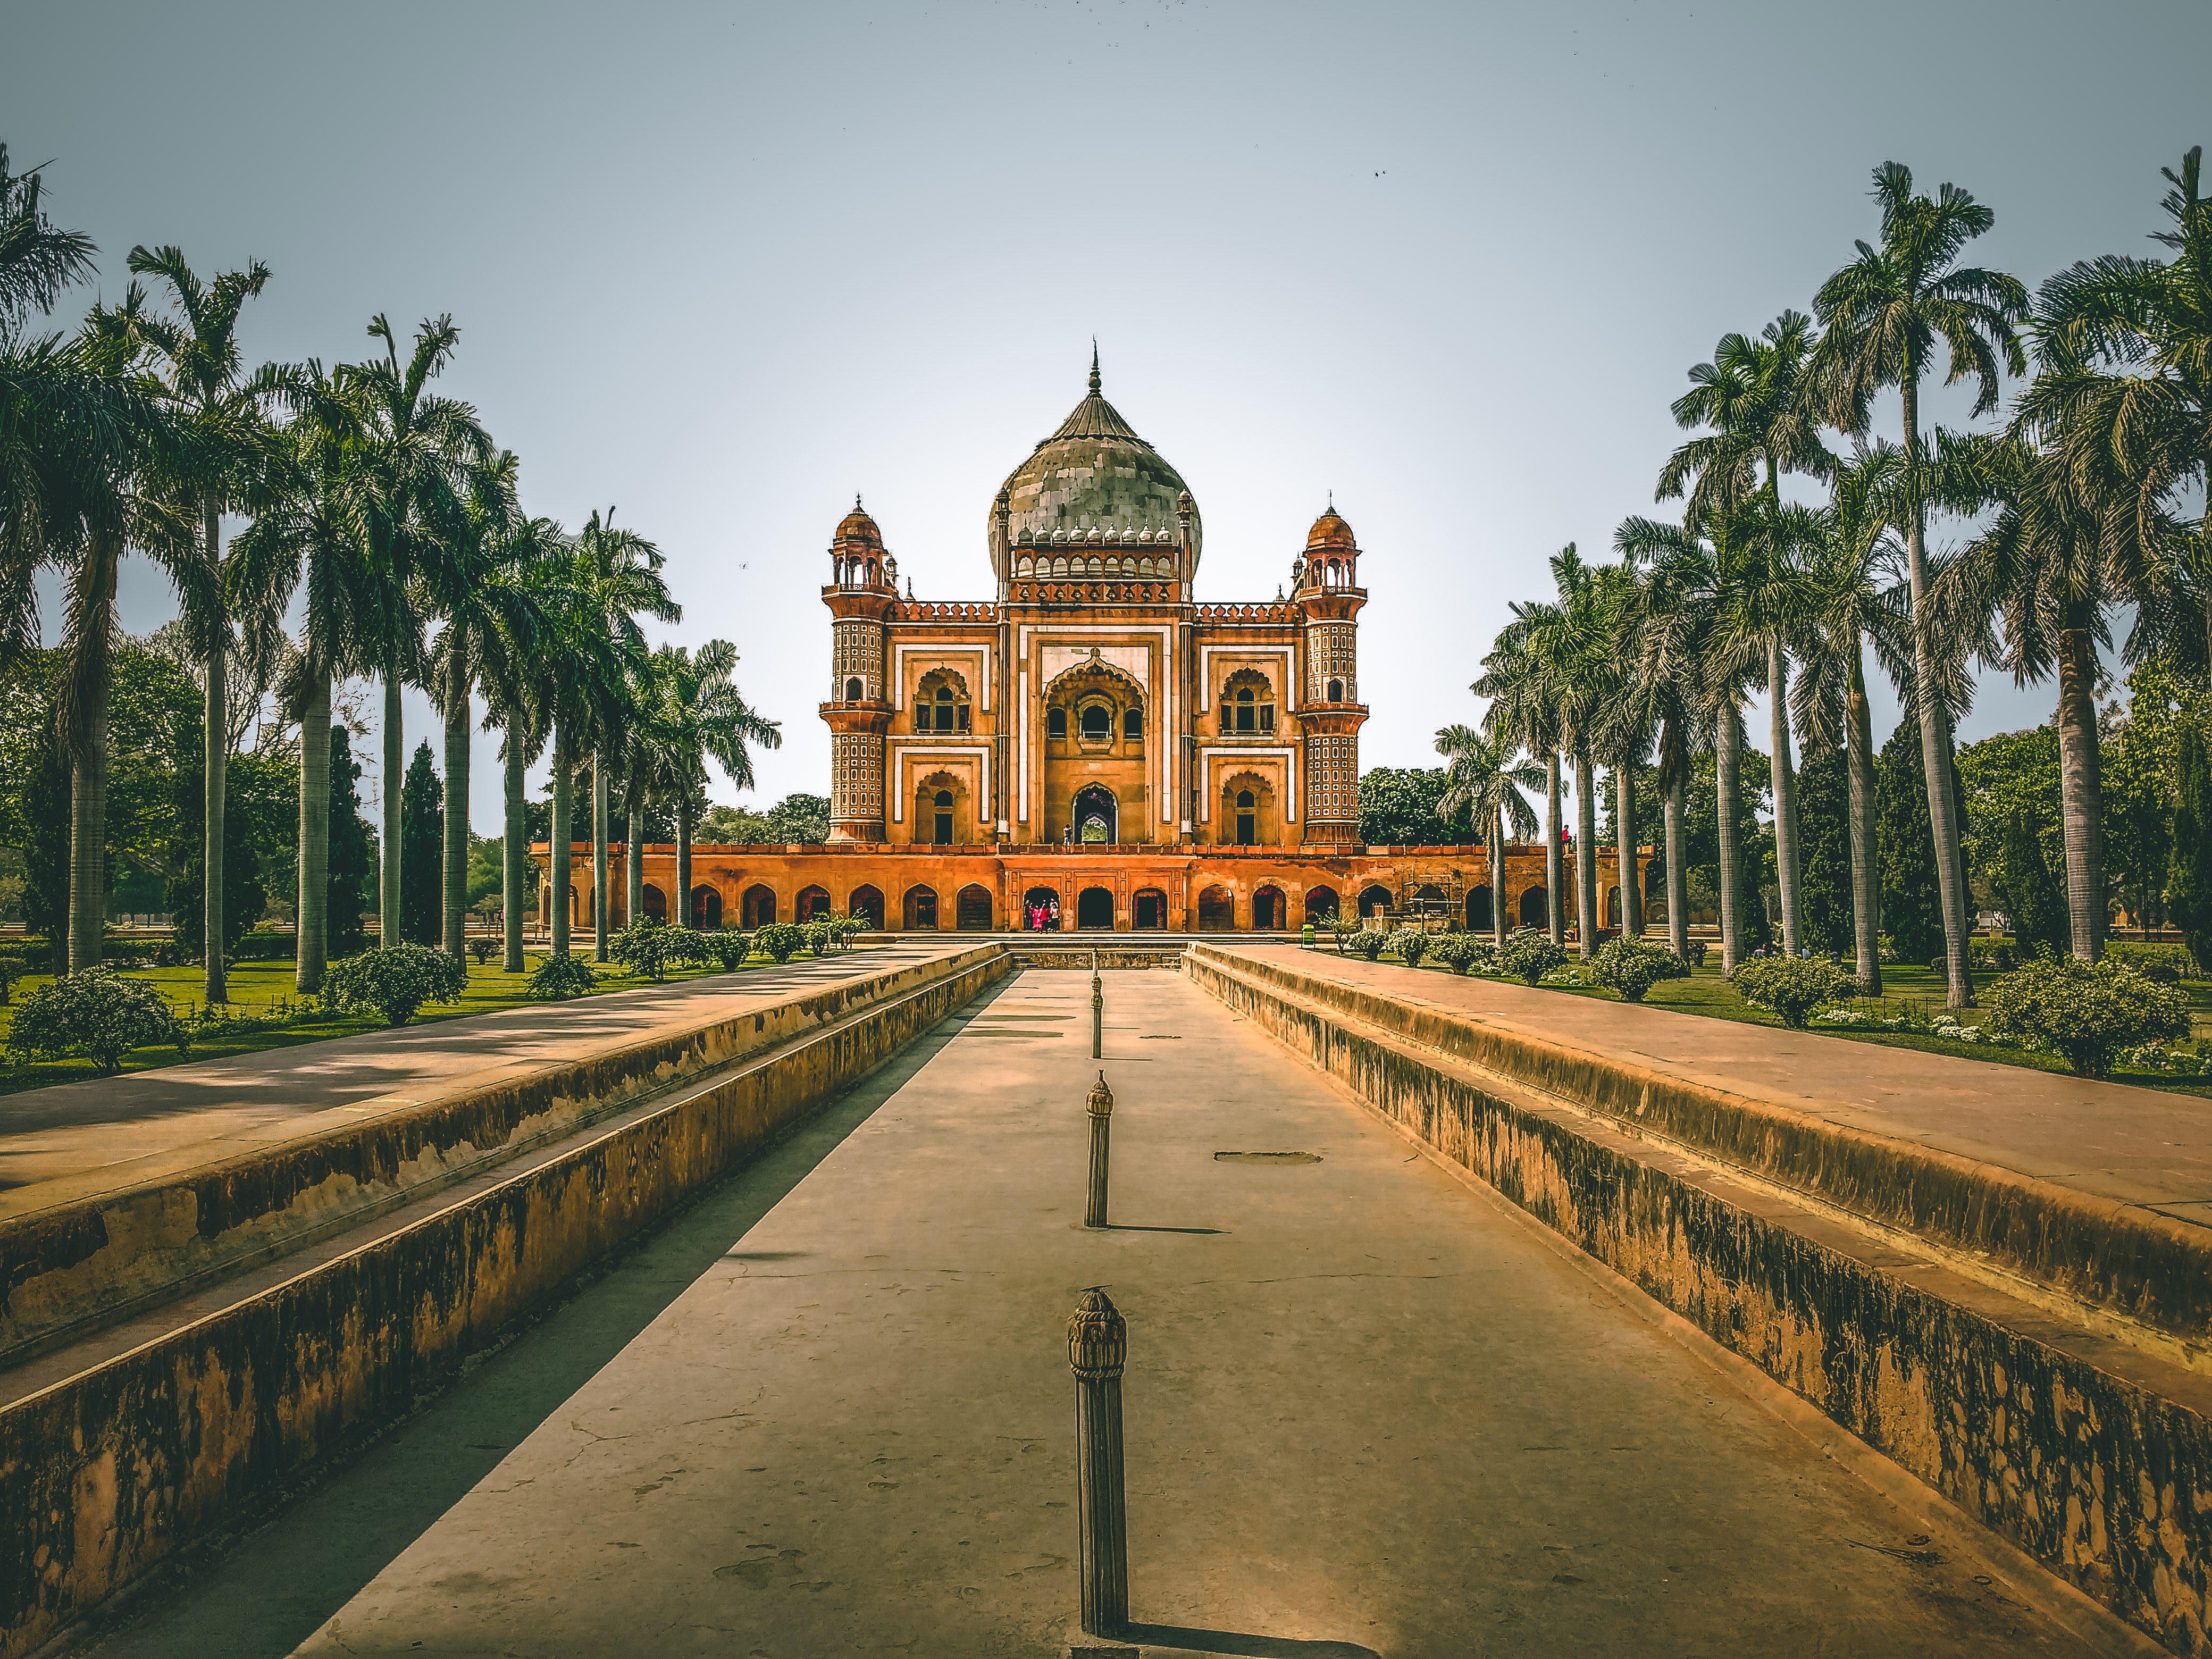 De New Delhi à Suger : carnet de voyage